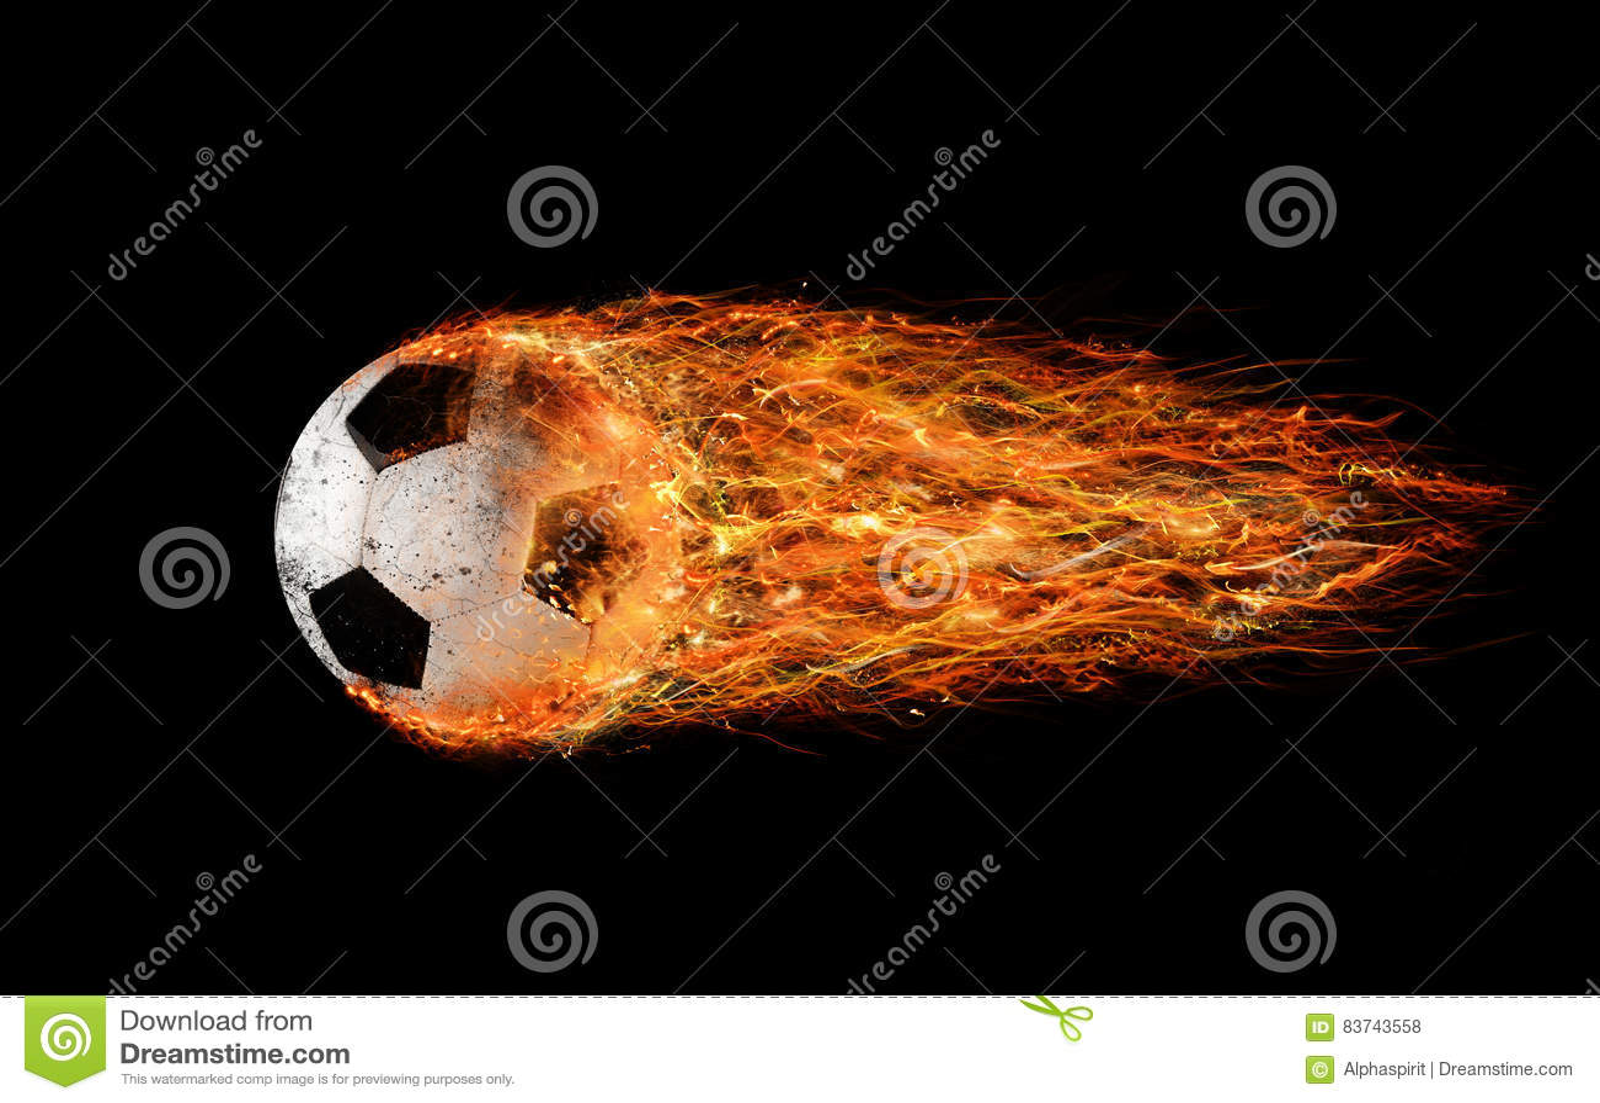 Aérolithe du football